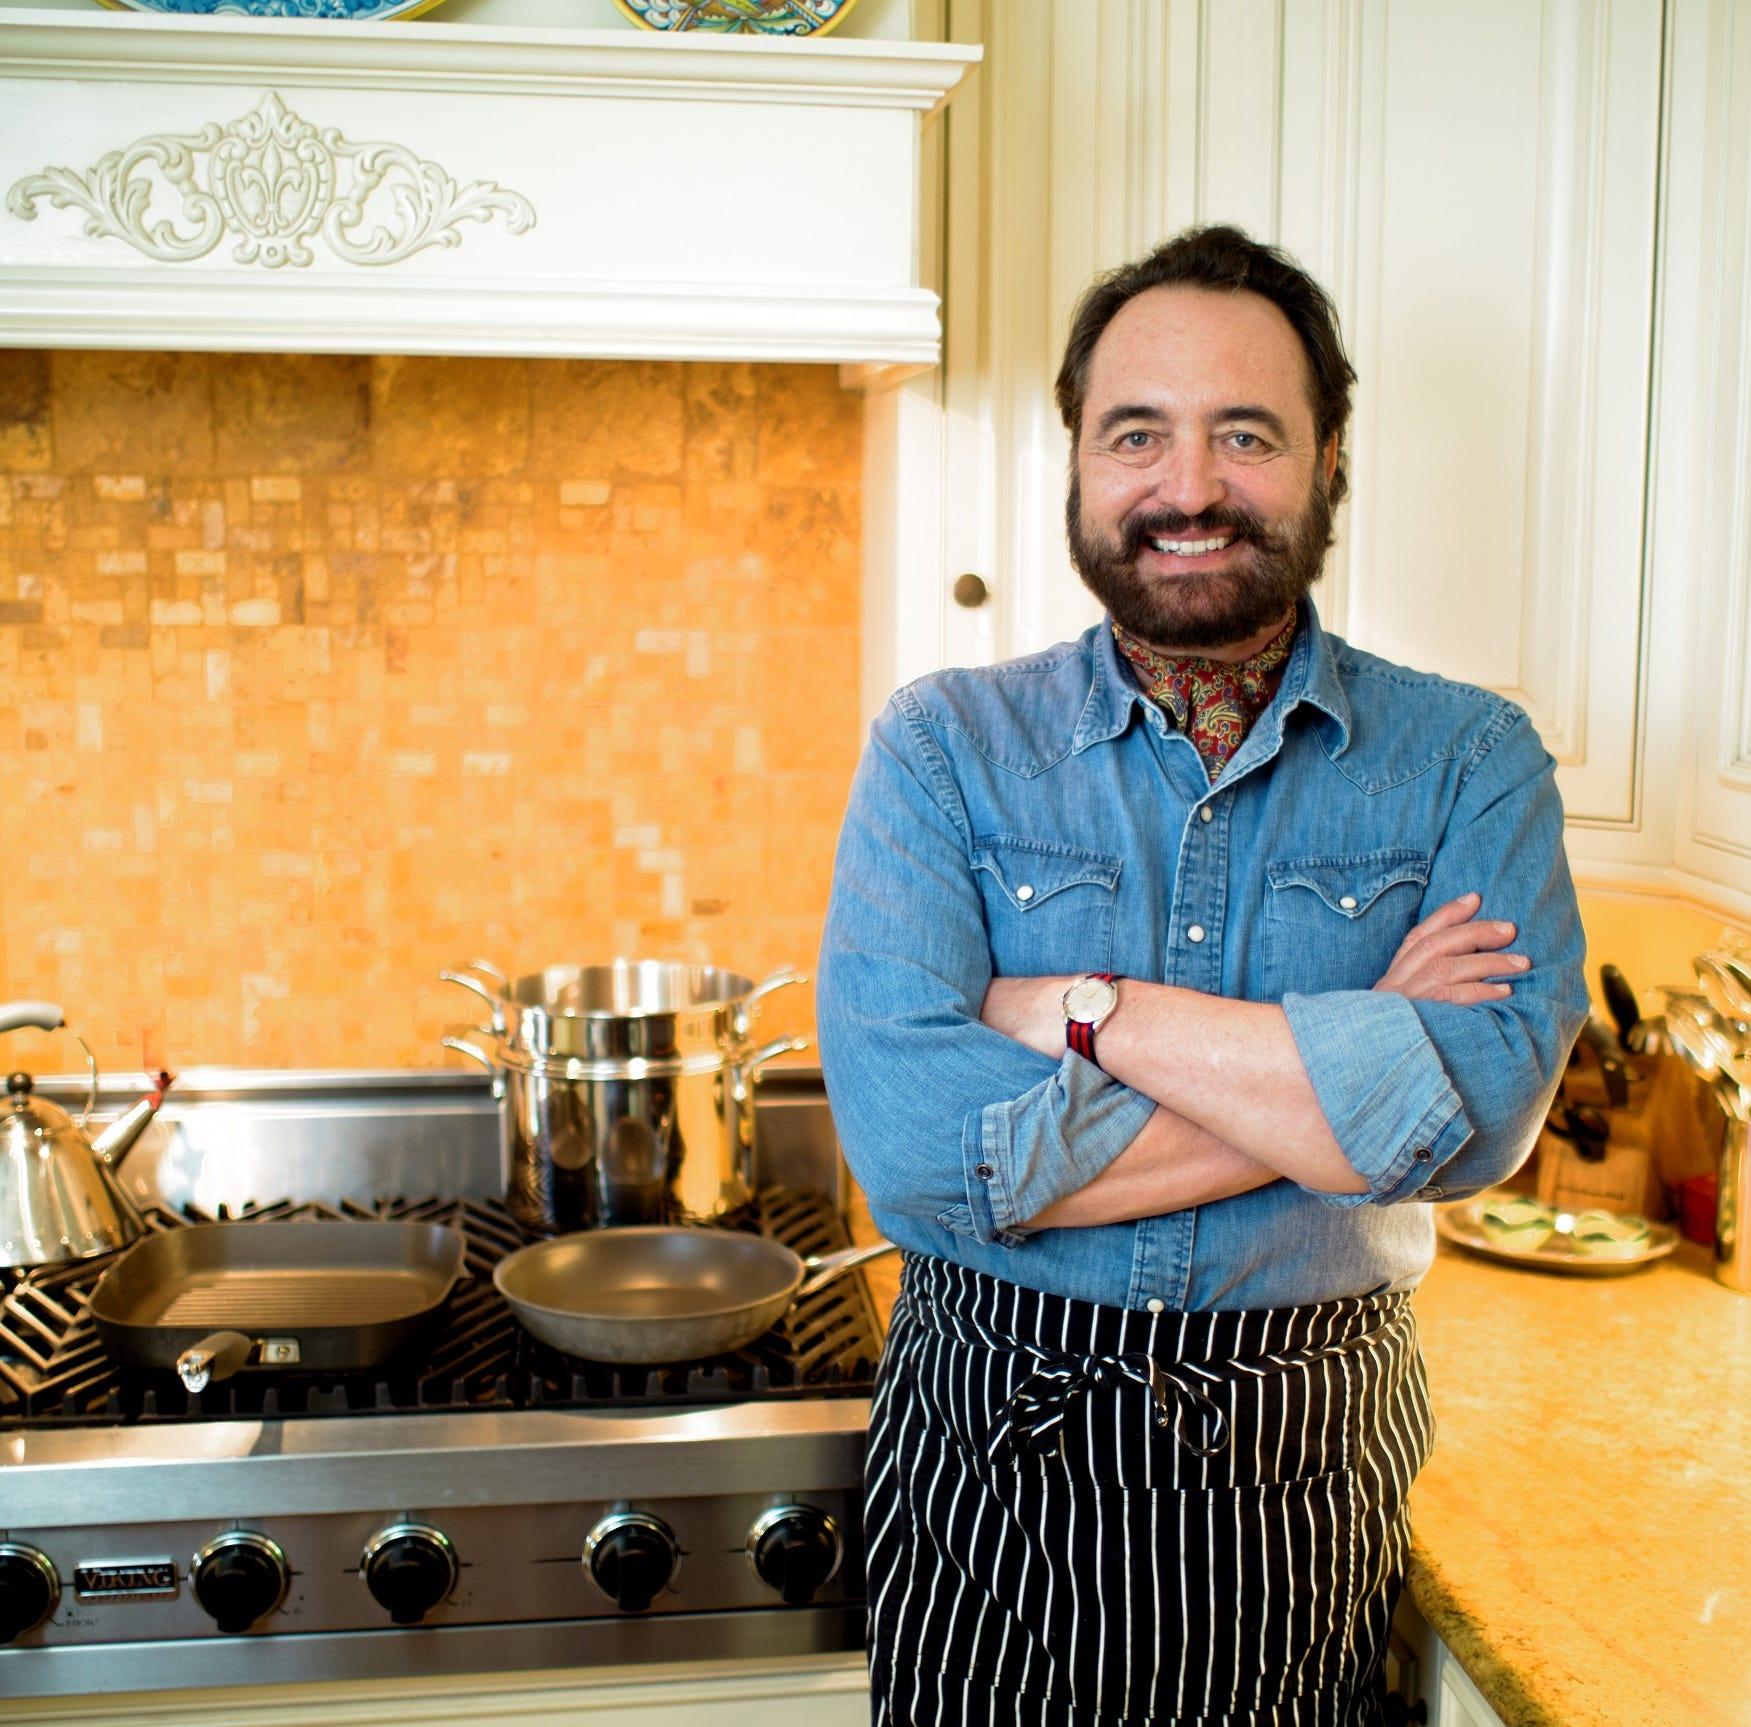 Chef Nick Stellino